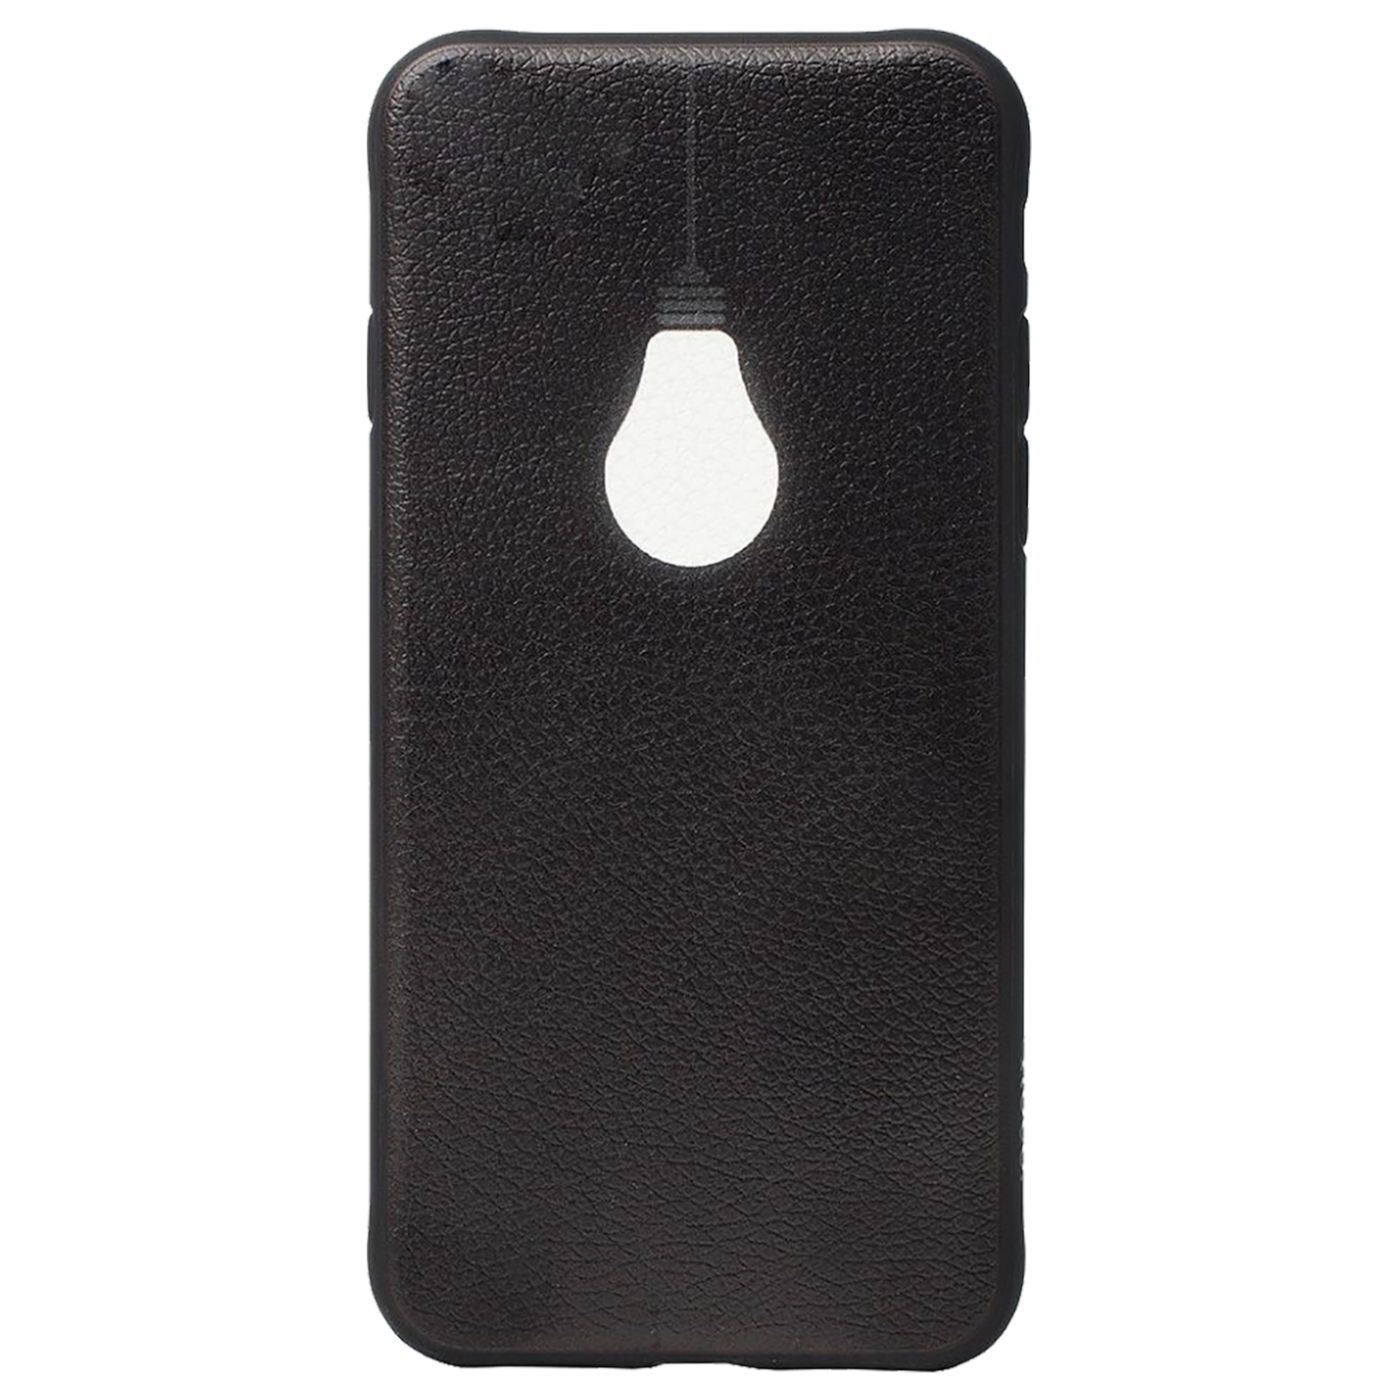 hoco. - Colored Series Case,Galaxy J3 bulb